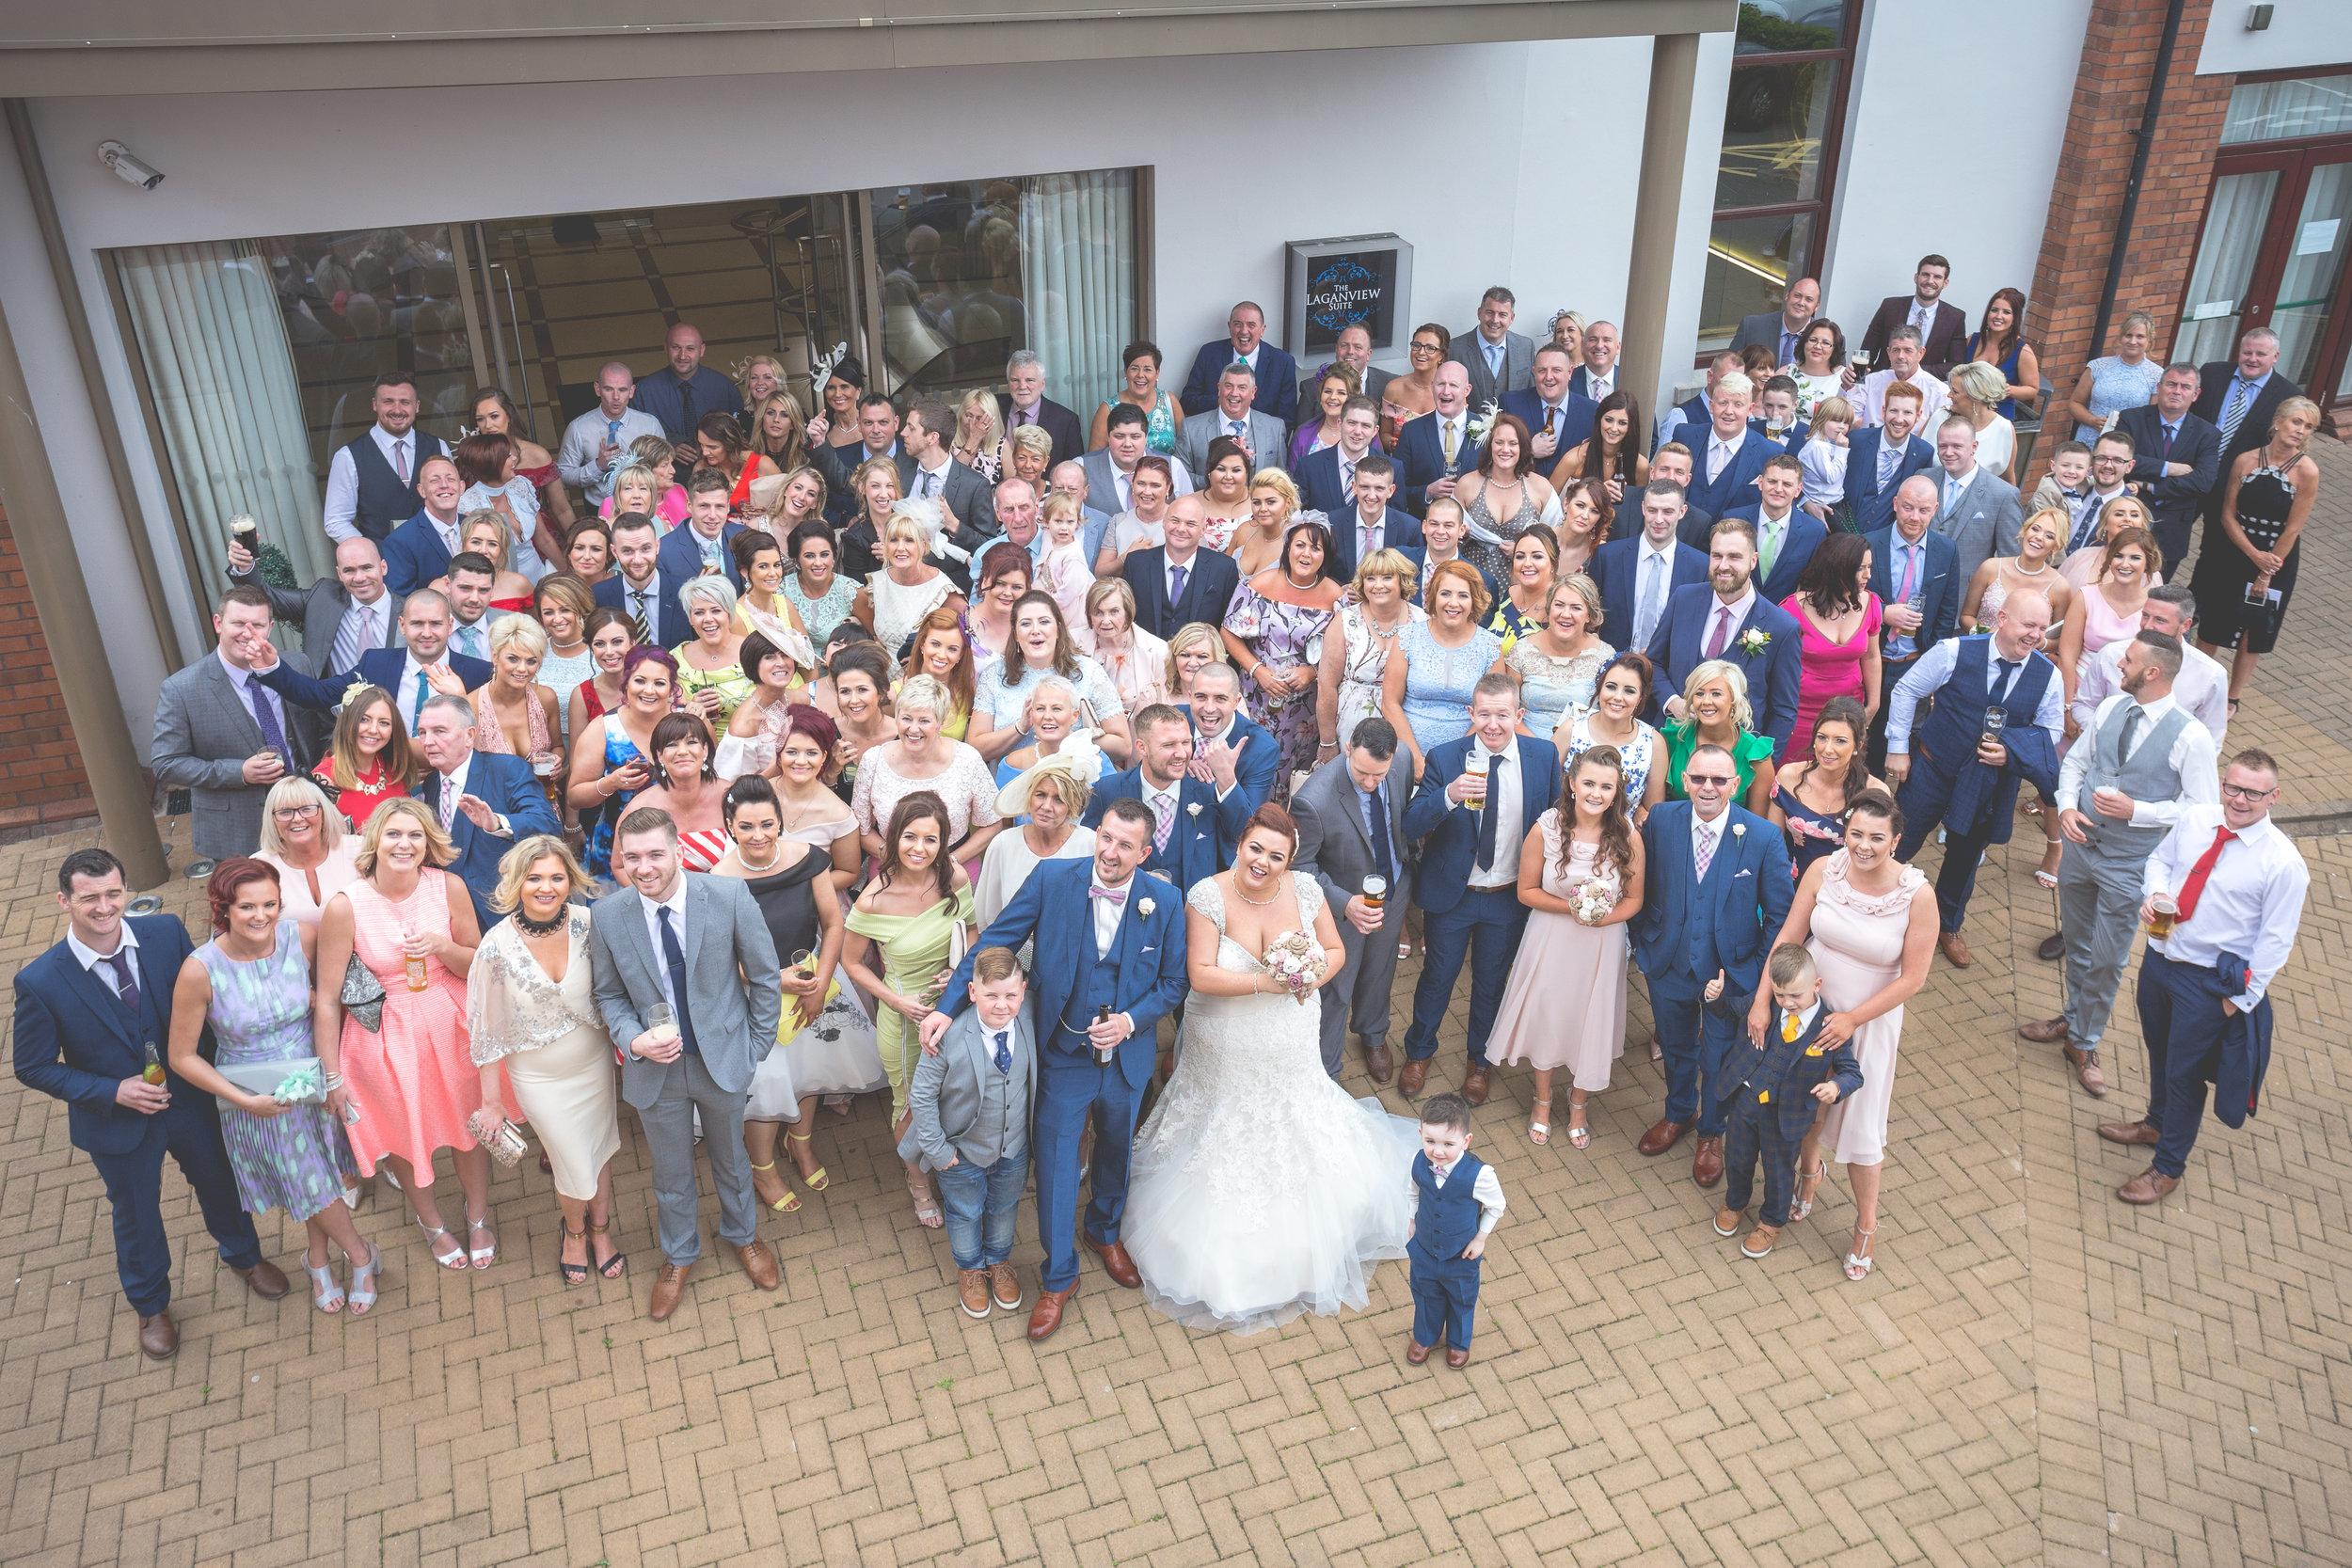 Antoinette & Stephen - Portraits   Brian McEwan Photography   Wedding Photographer Northern Ireland 121.jpg